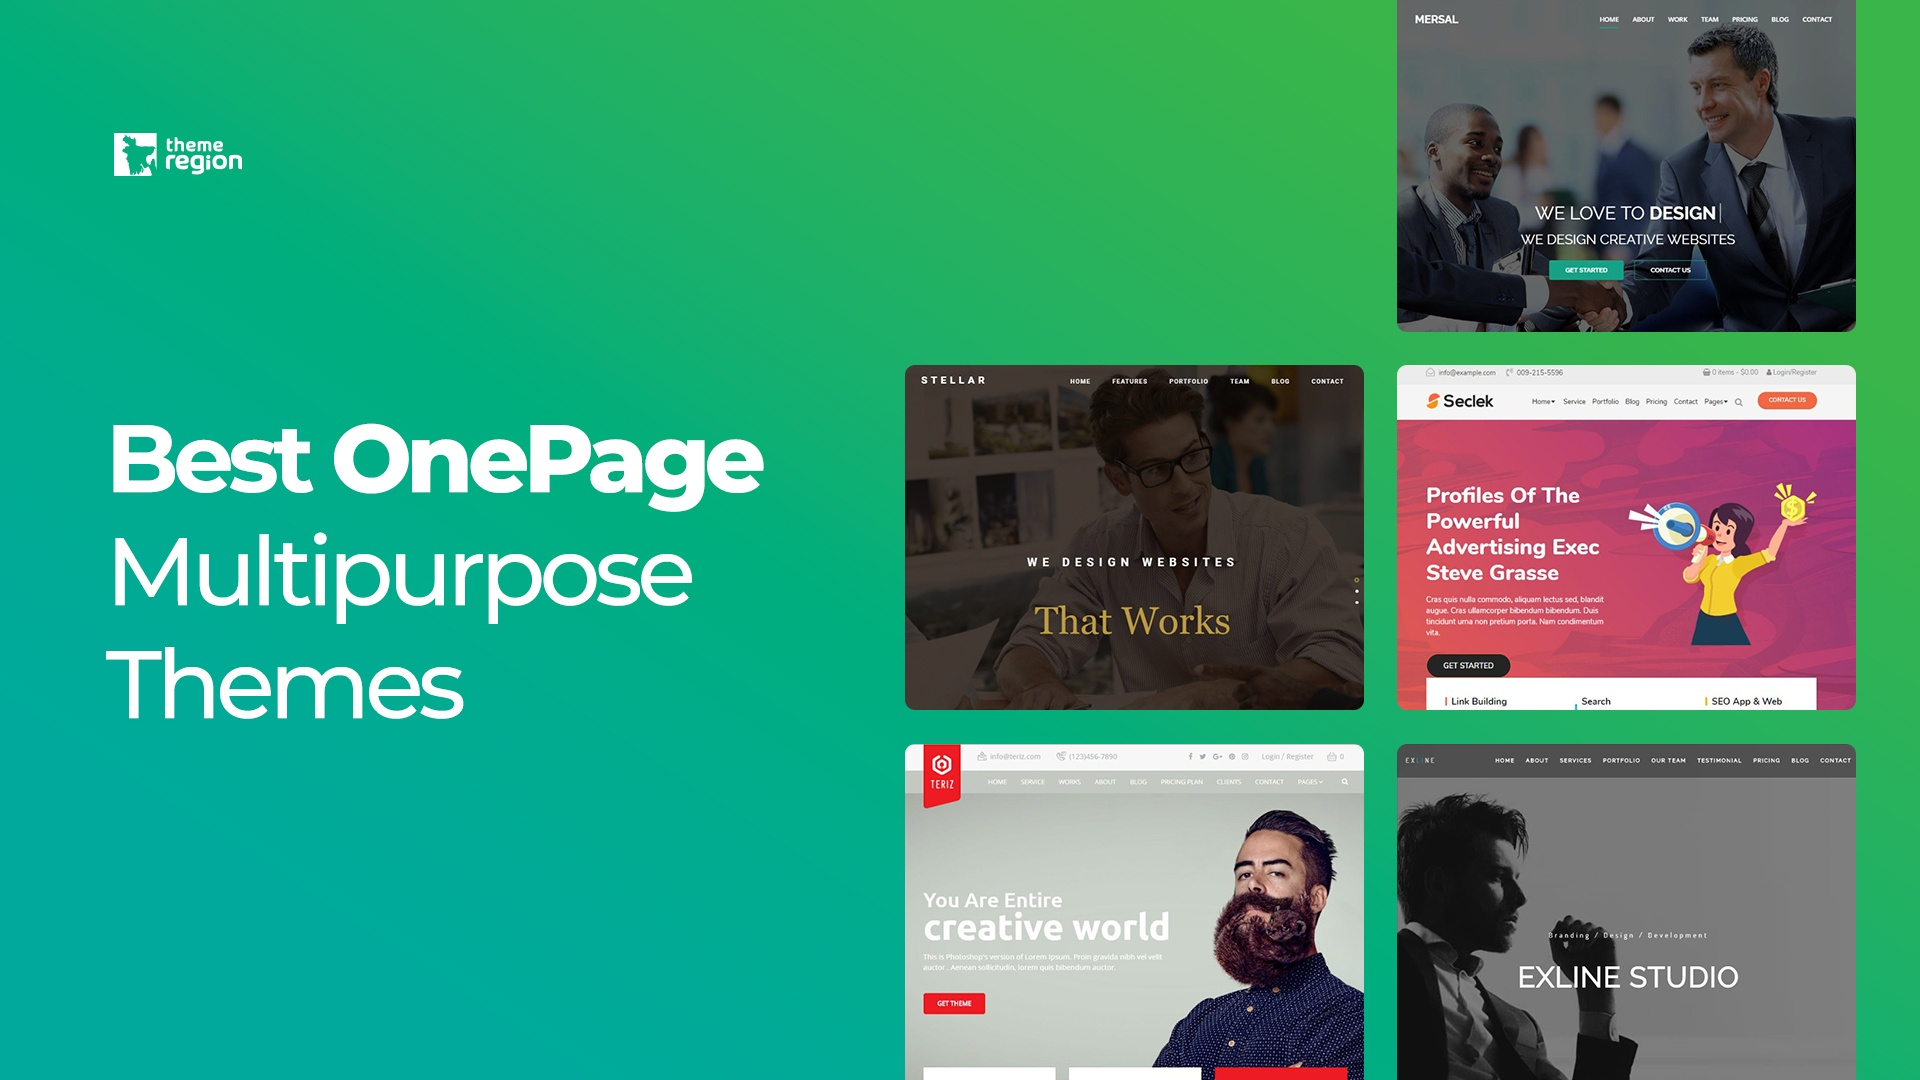 Best OnePage Multipurpose Themes for WordPress 2018